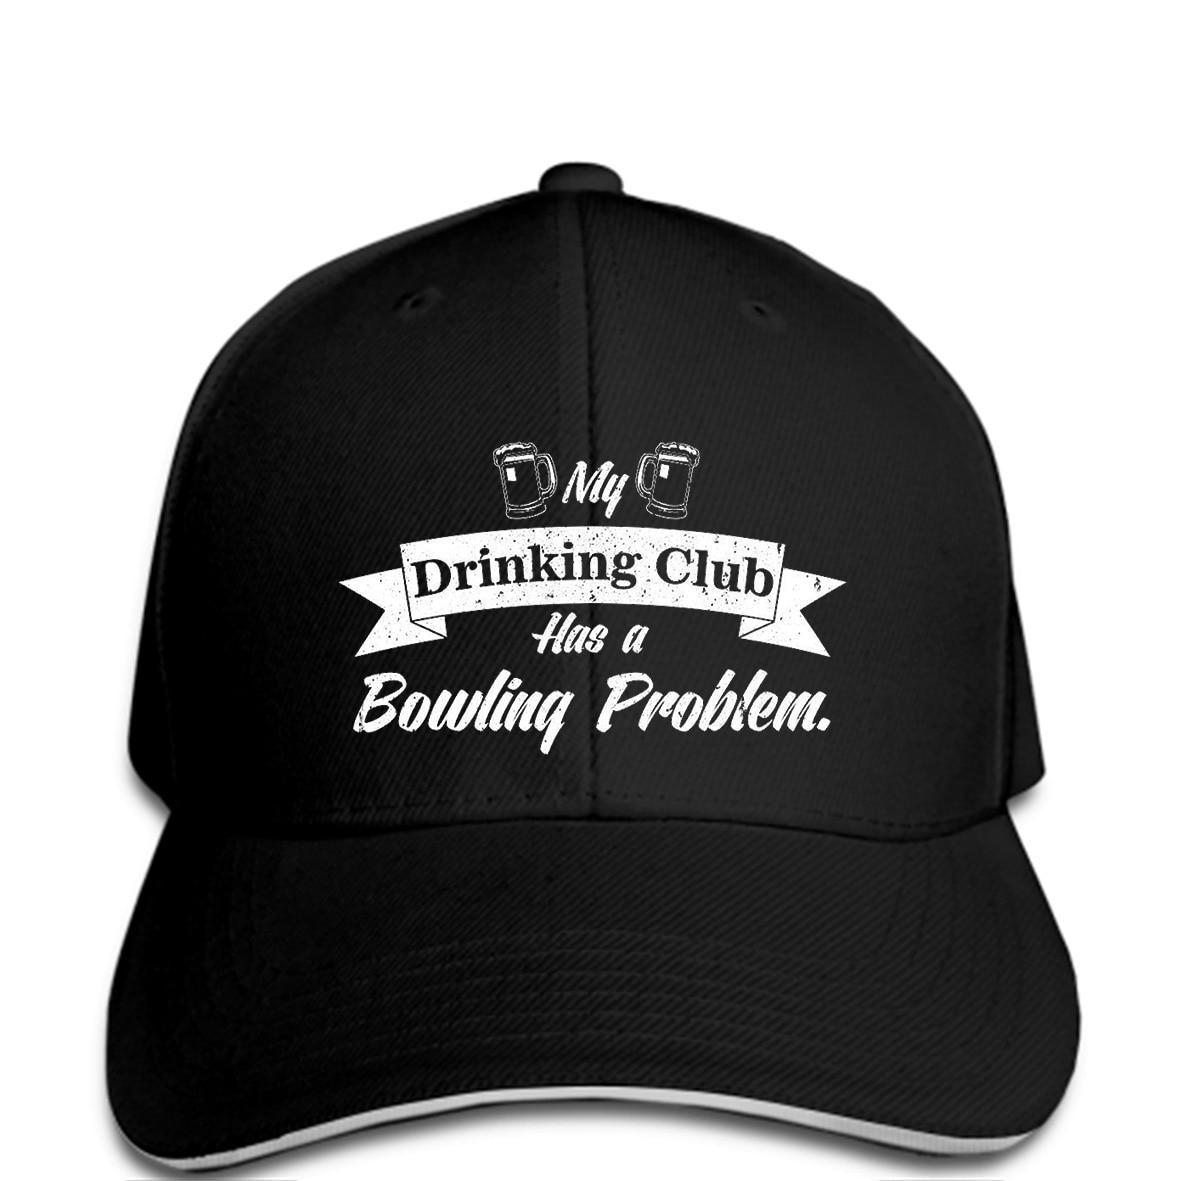 My Drinking Club Has A Bowling Problem T-SHIRT lawn bowls dad birthday gift 123t